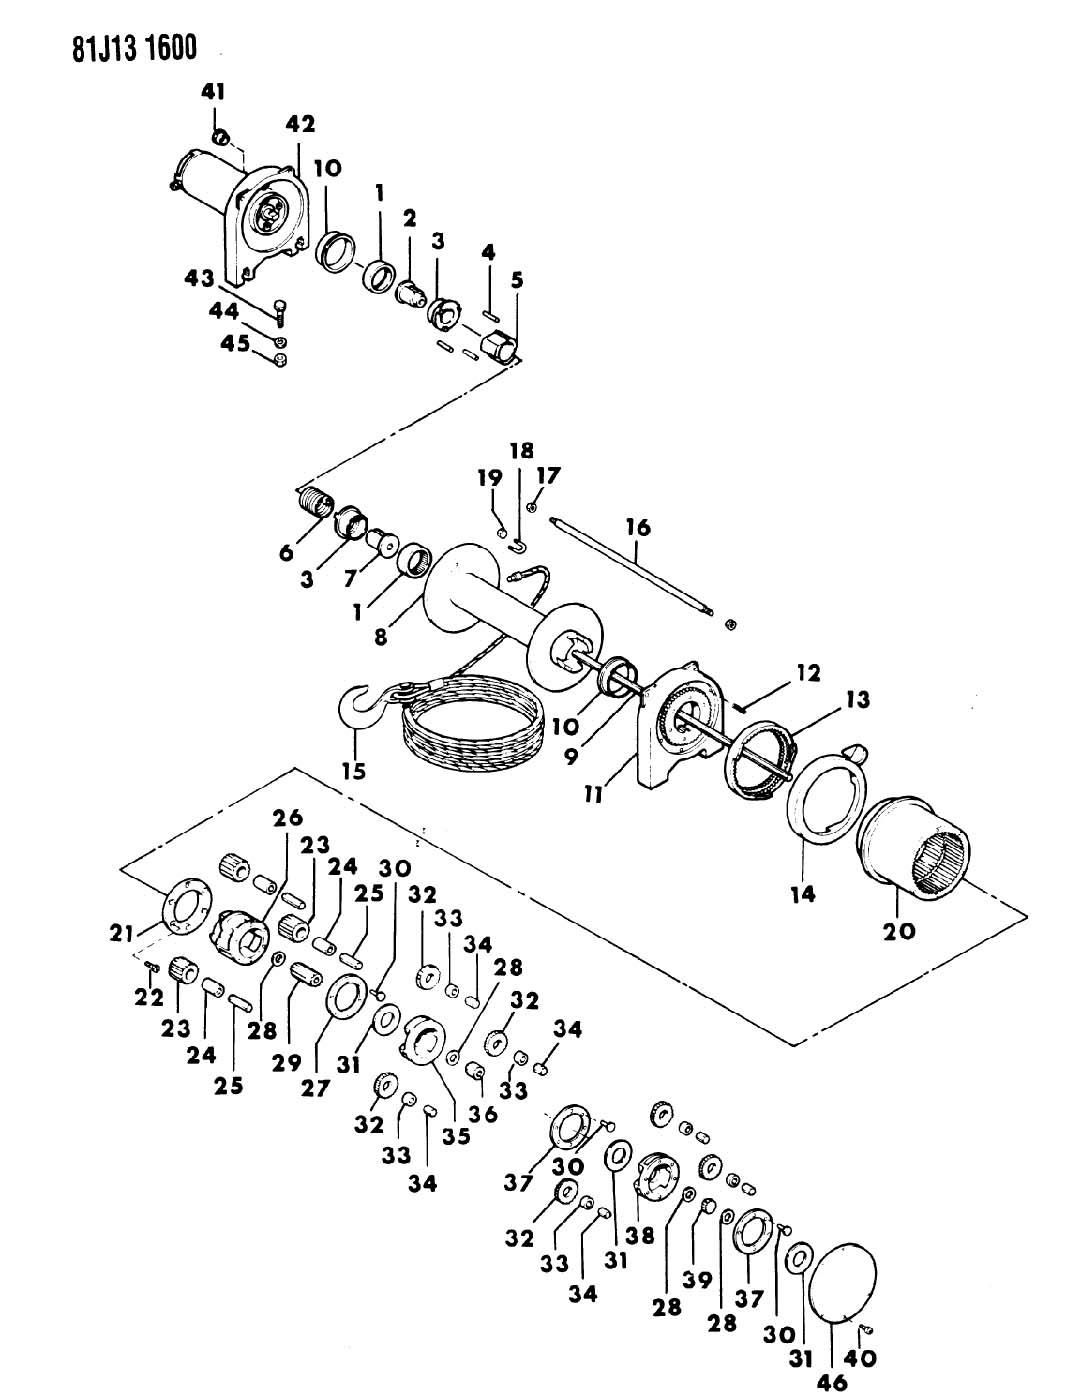 Wiring Diagram 1200 Ramsey Winch Diagrams Pierce Hydraulic Parts Bing Images